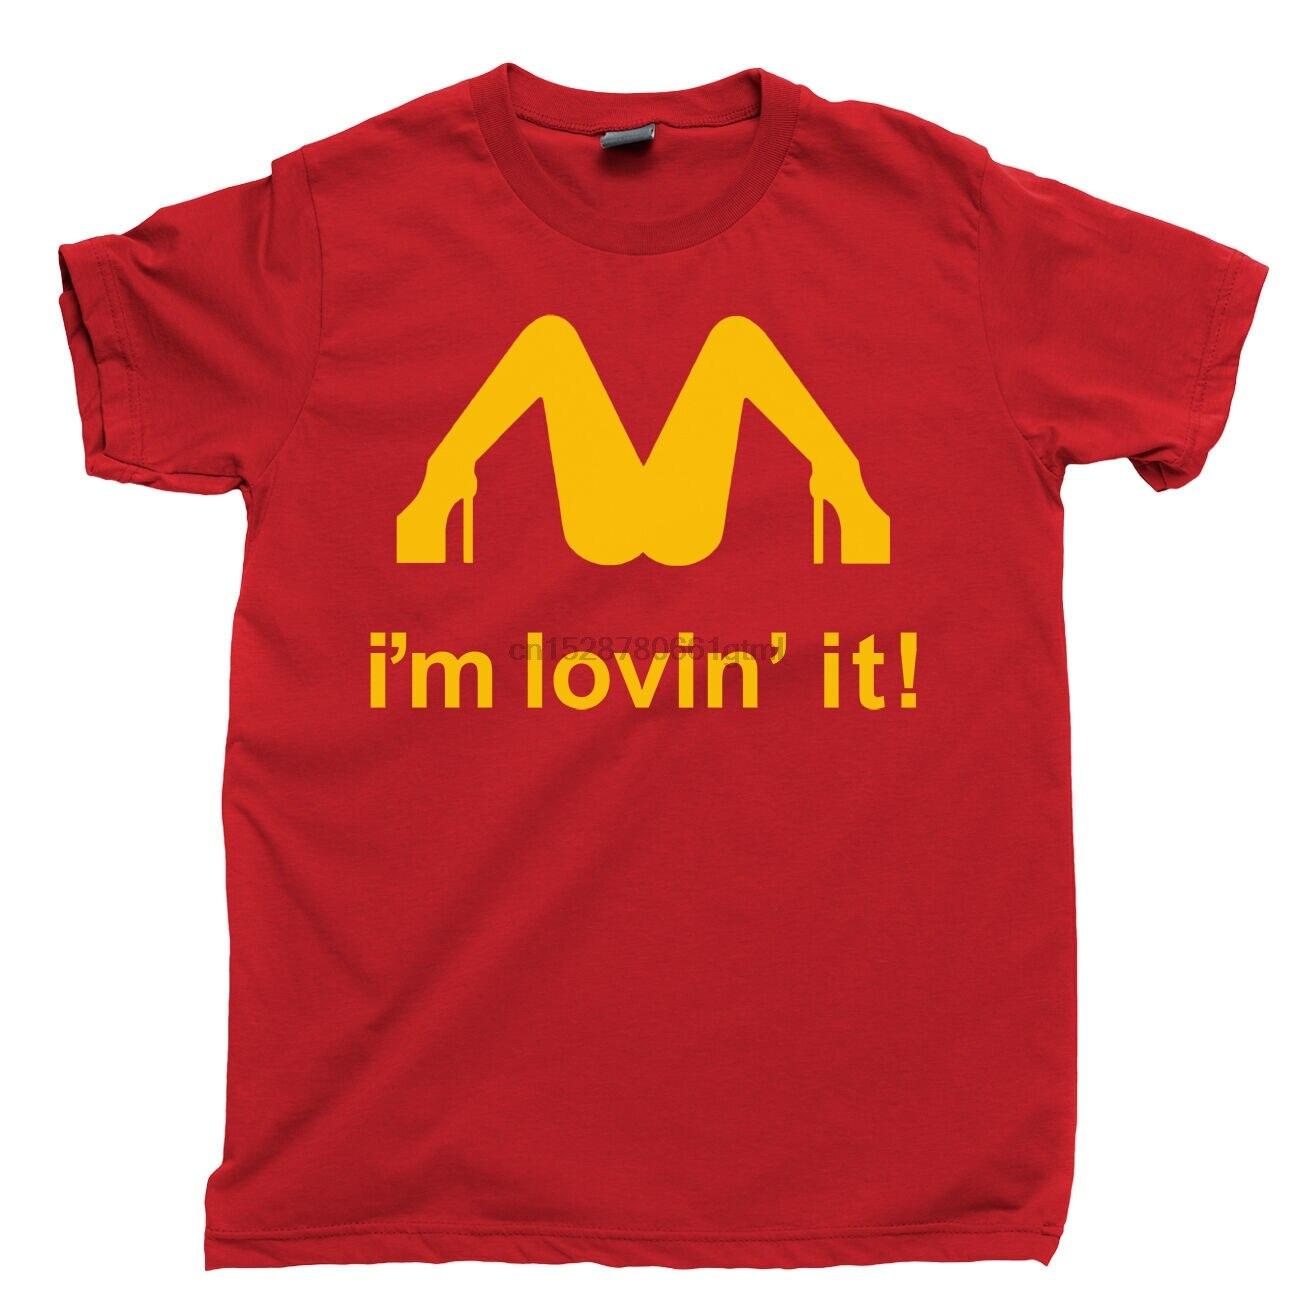 Me encanta barra T camisa Axl Duff Izzy Stradlin Tee